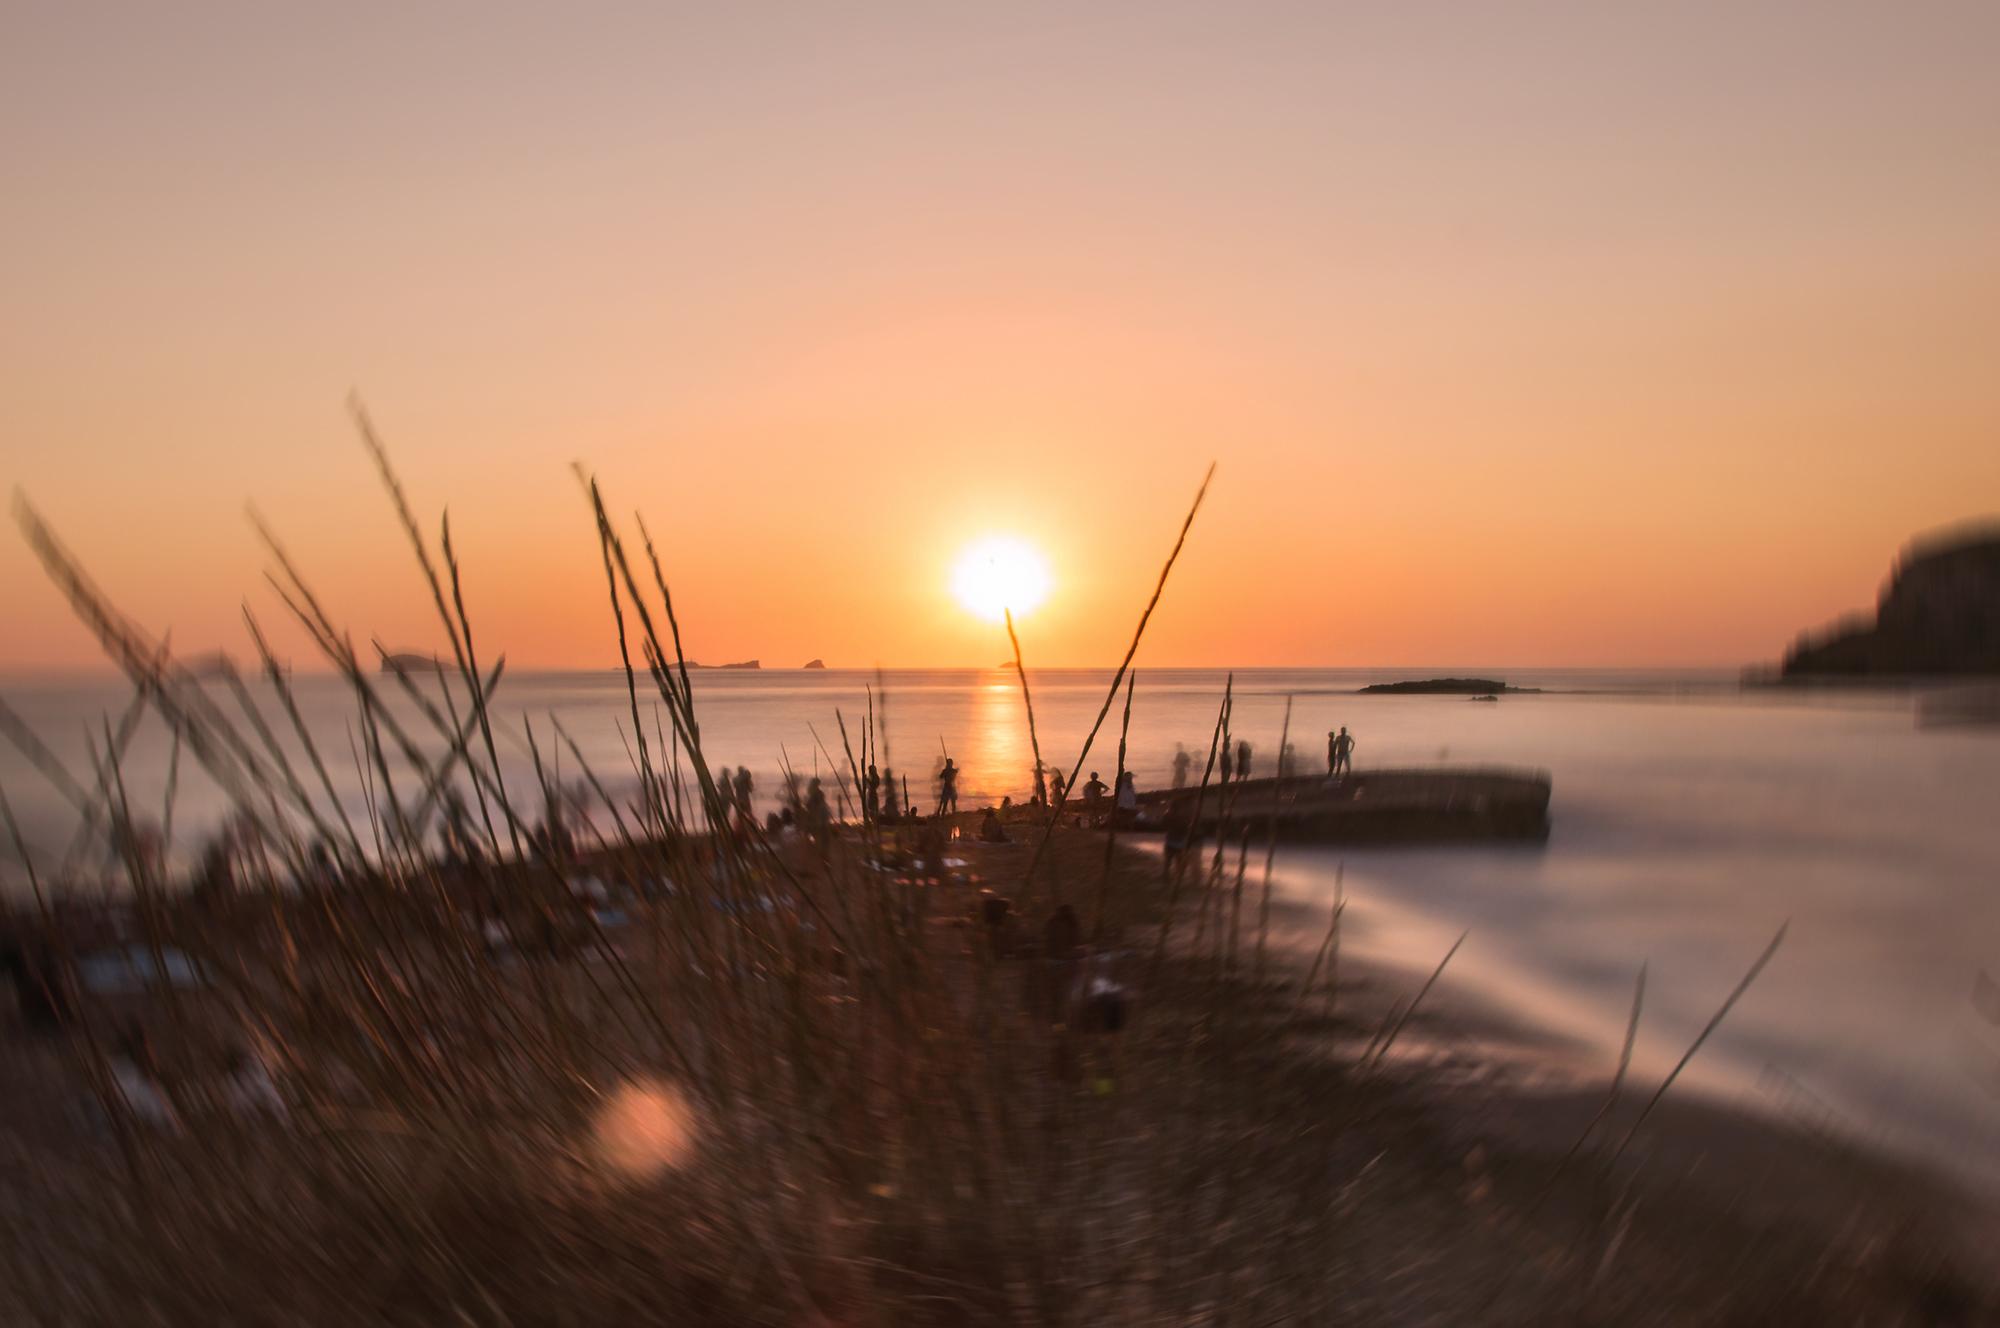 felicidad_de_lucas_ibiza_conte_sunset_radial_3-web.jpg